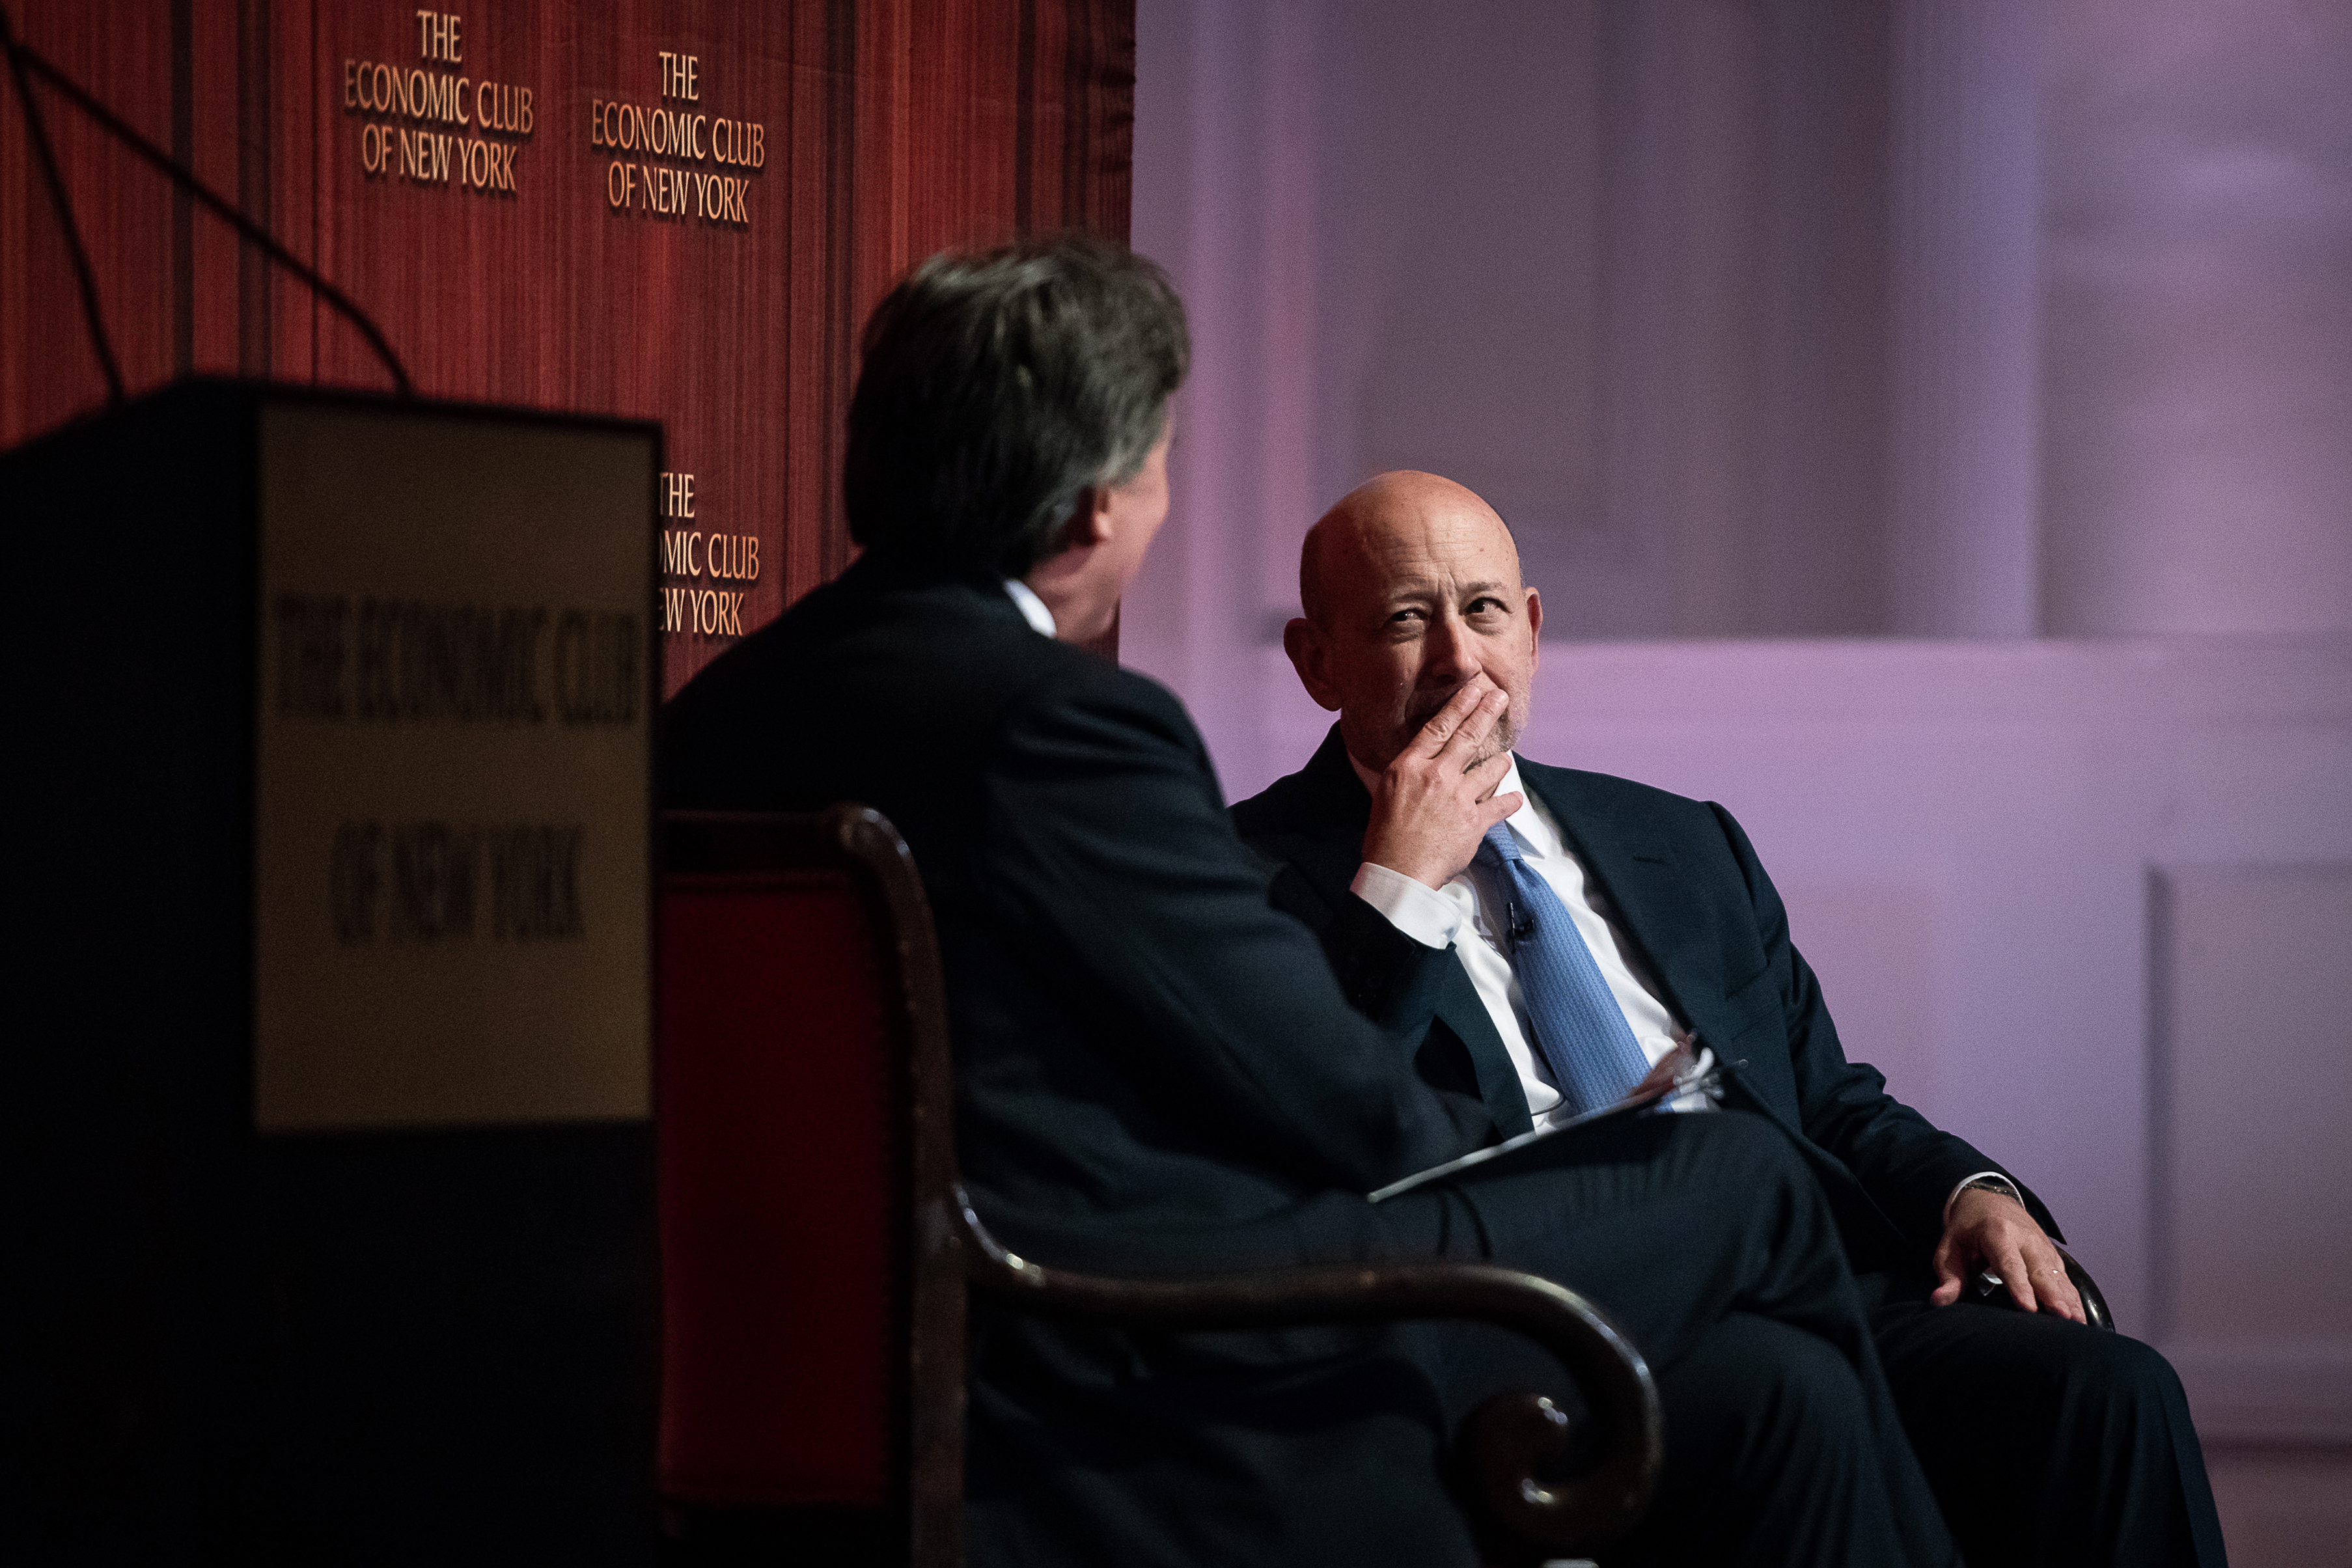 Goldman Sachs Lloyd blankfein trump immigration